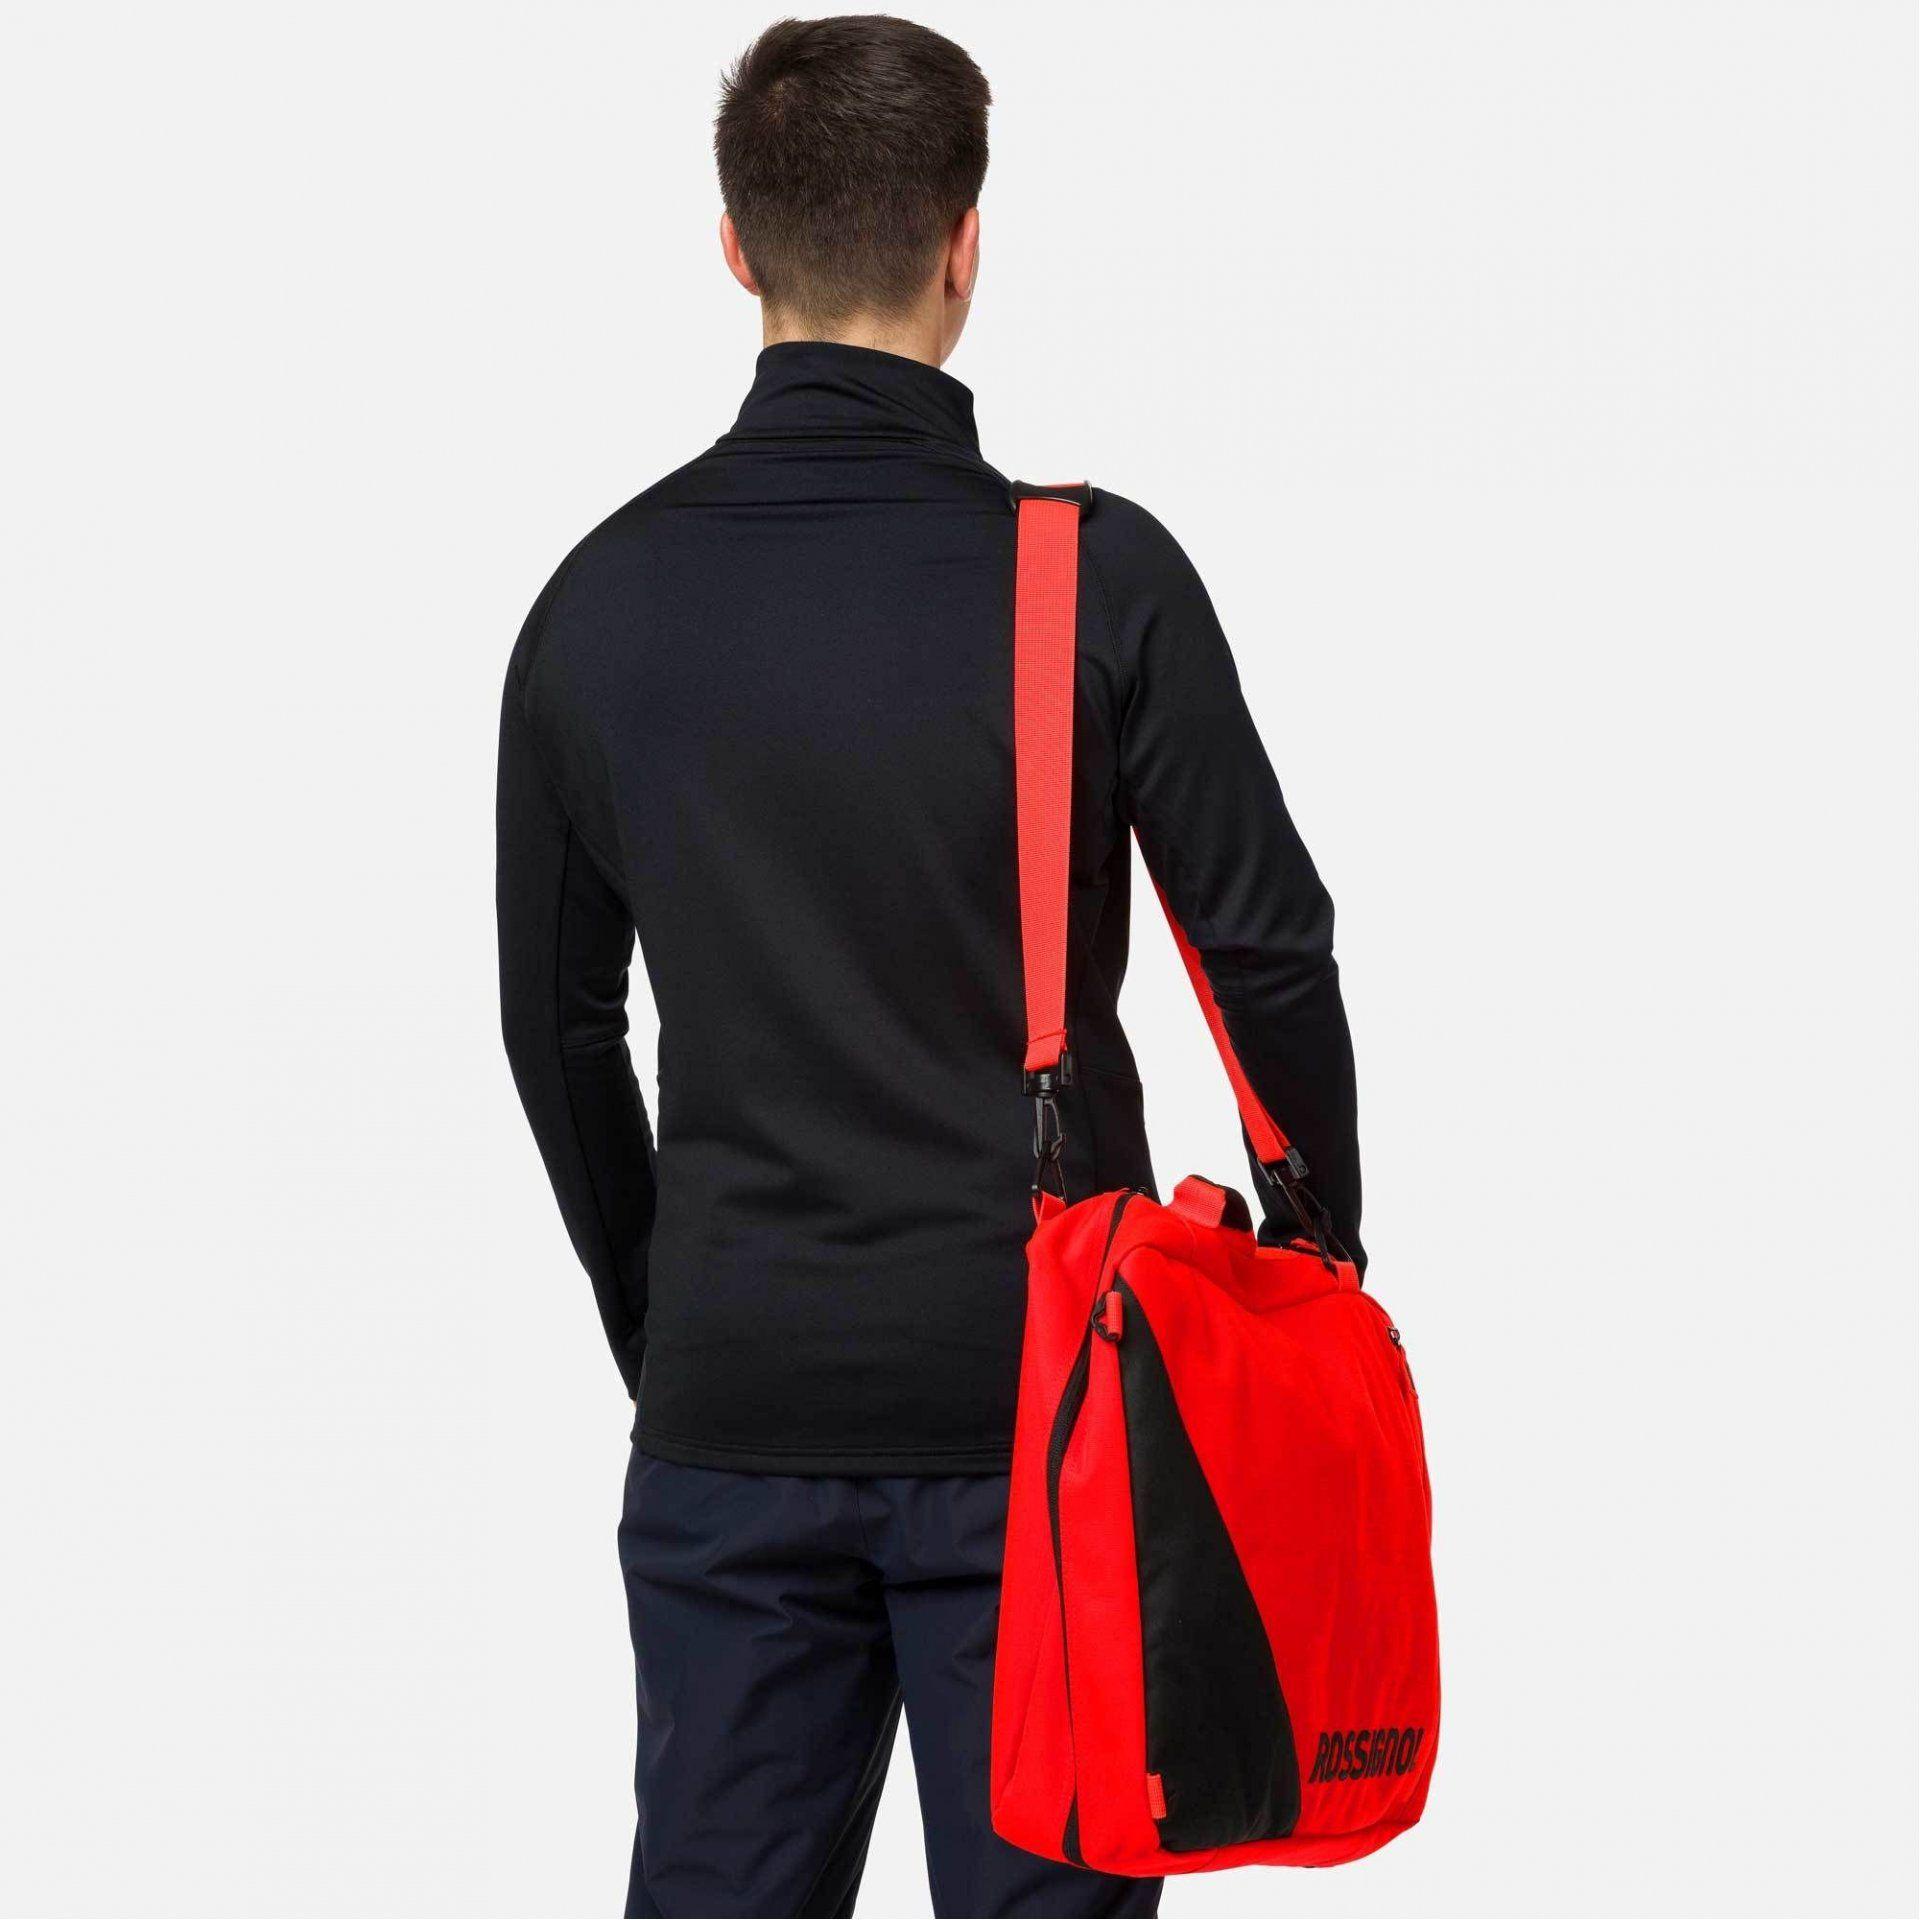 TORBA NA BUTY ROSSIGNOL HERO DUAL BOOT BAG RKHB108 5